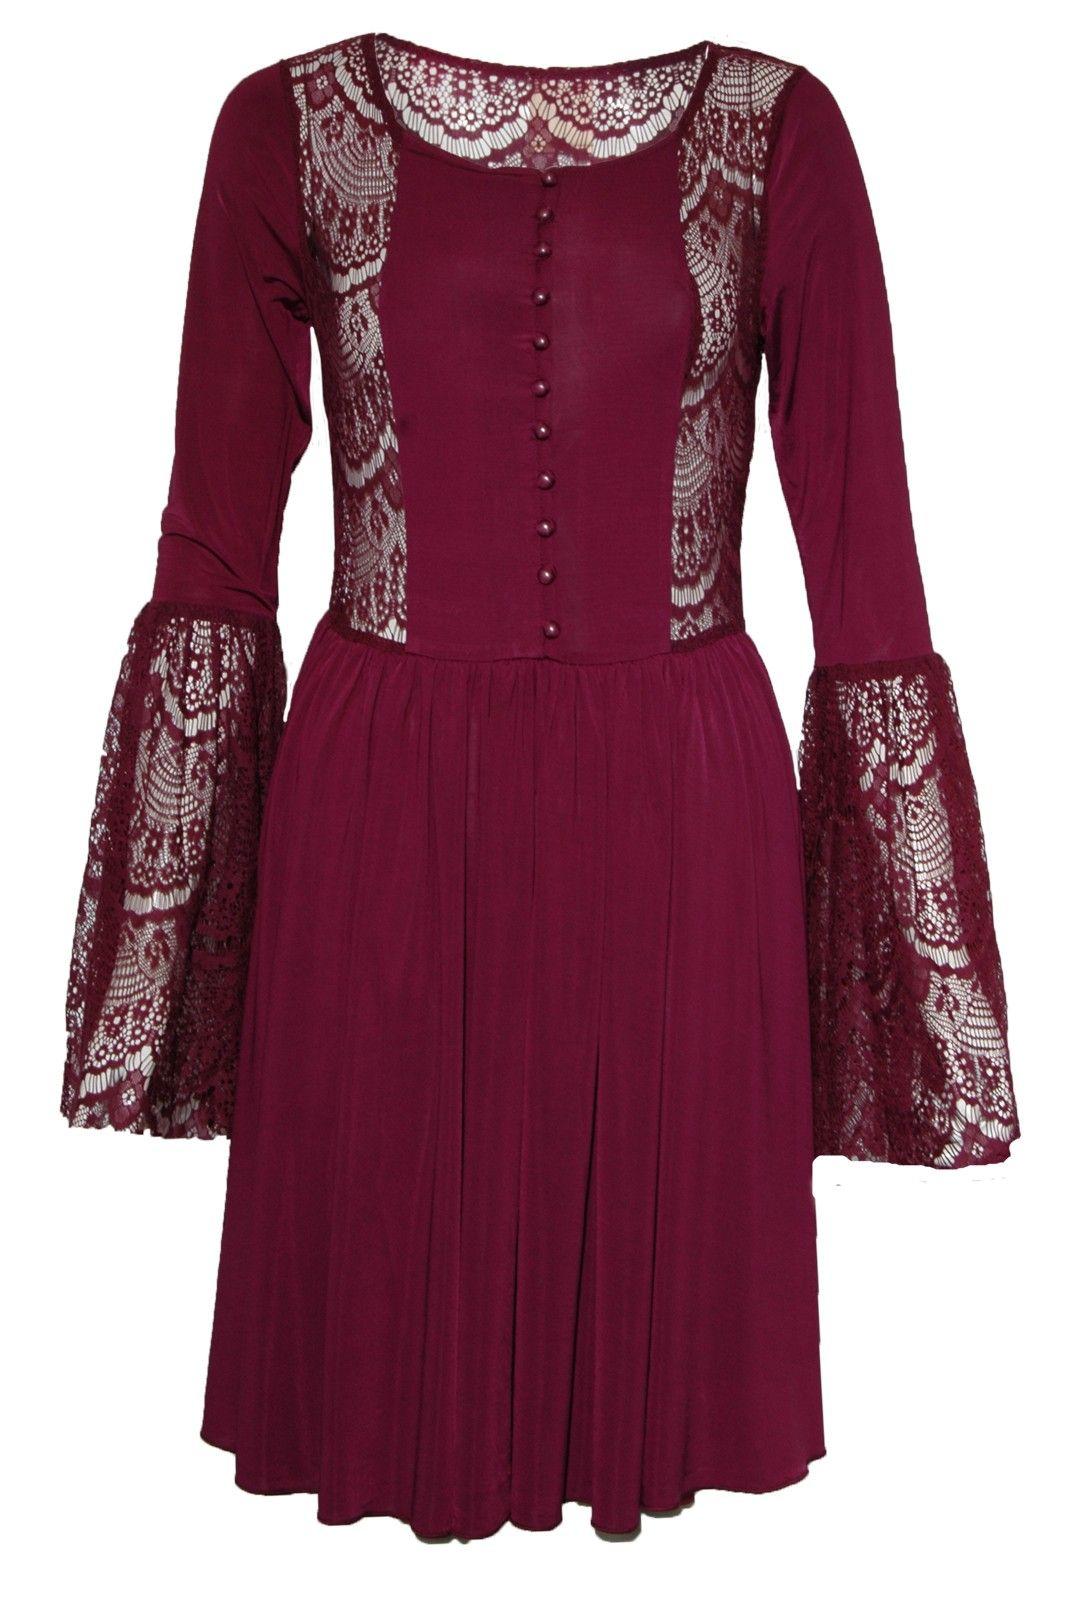 Lace Trim Flared Sleeve Skater- Dress beautifully designed!